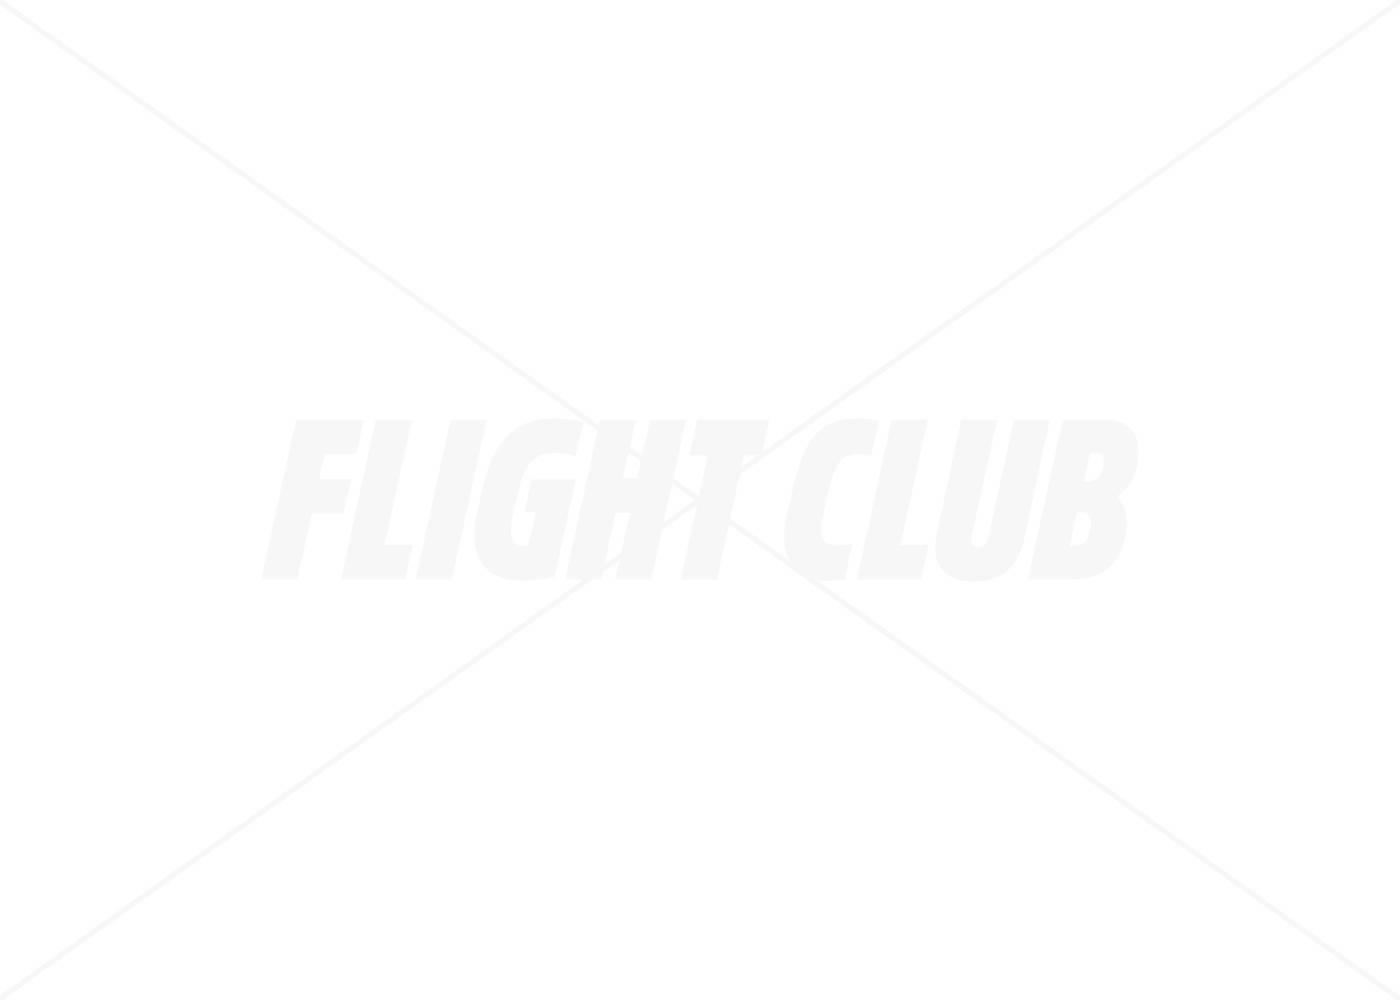 nmd r1 w pk adidas bb2364 black pink white flight club. Black Bedroom Furniture Sets. Home Design Ideas